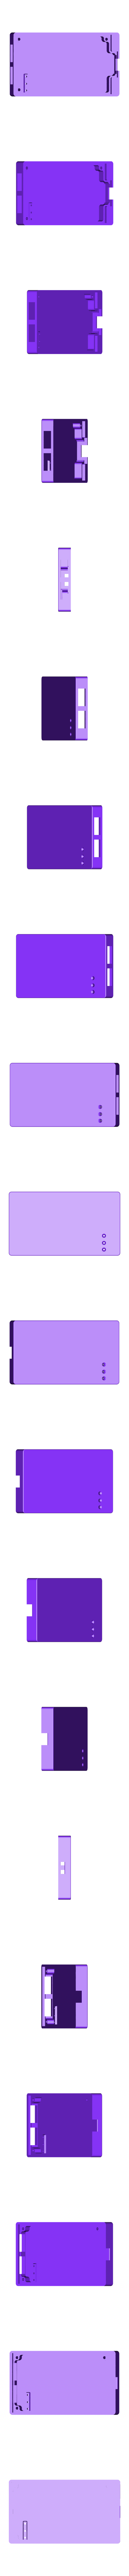 AtmelICE1-top.stl Download free STL file Enclosure ( box ) for ATMEL  programmer ATATMEL ICE PCBA  DEBUGGER,  ARM & AVR, PCBA KIT • 3D printable template, glassy